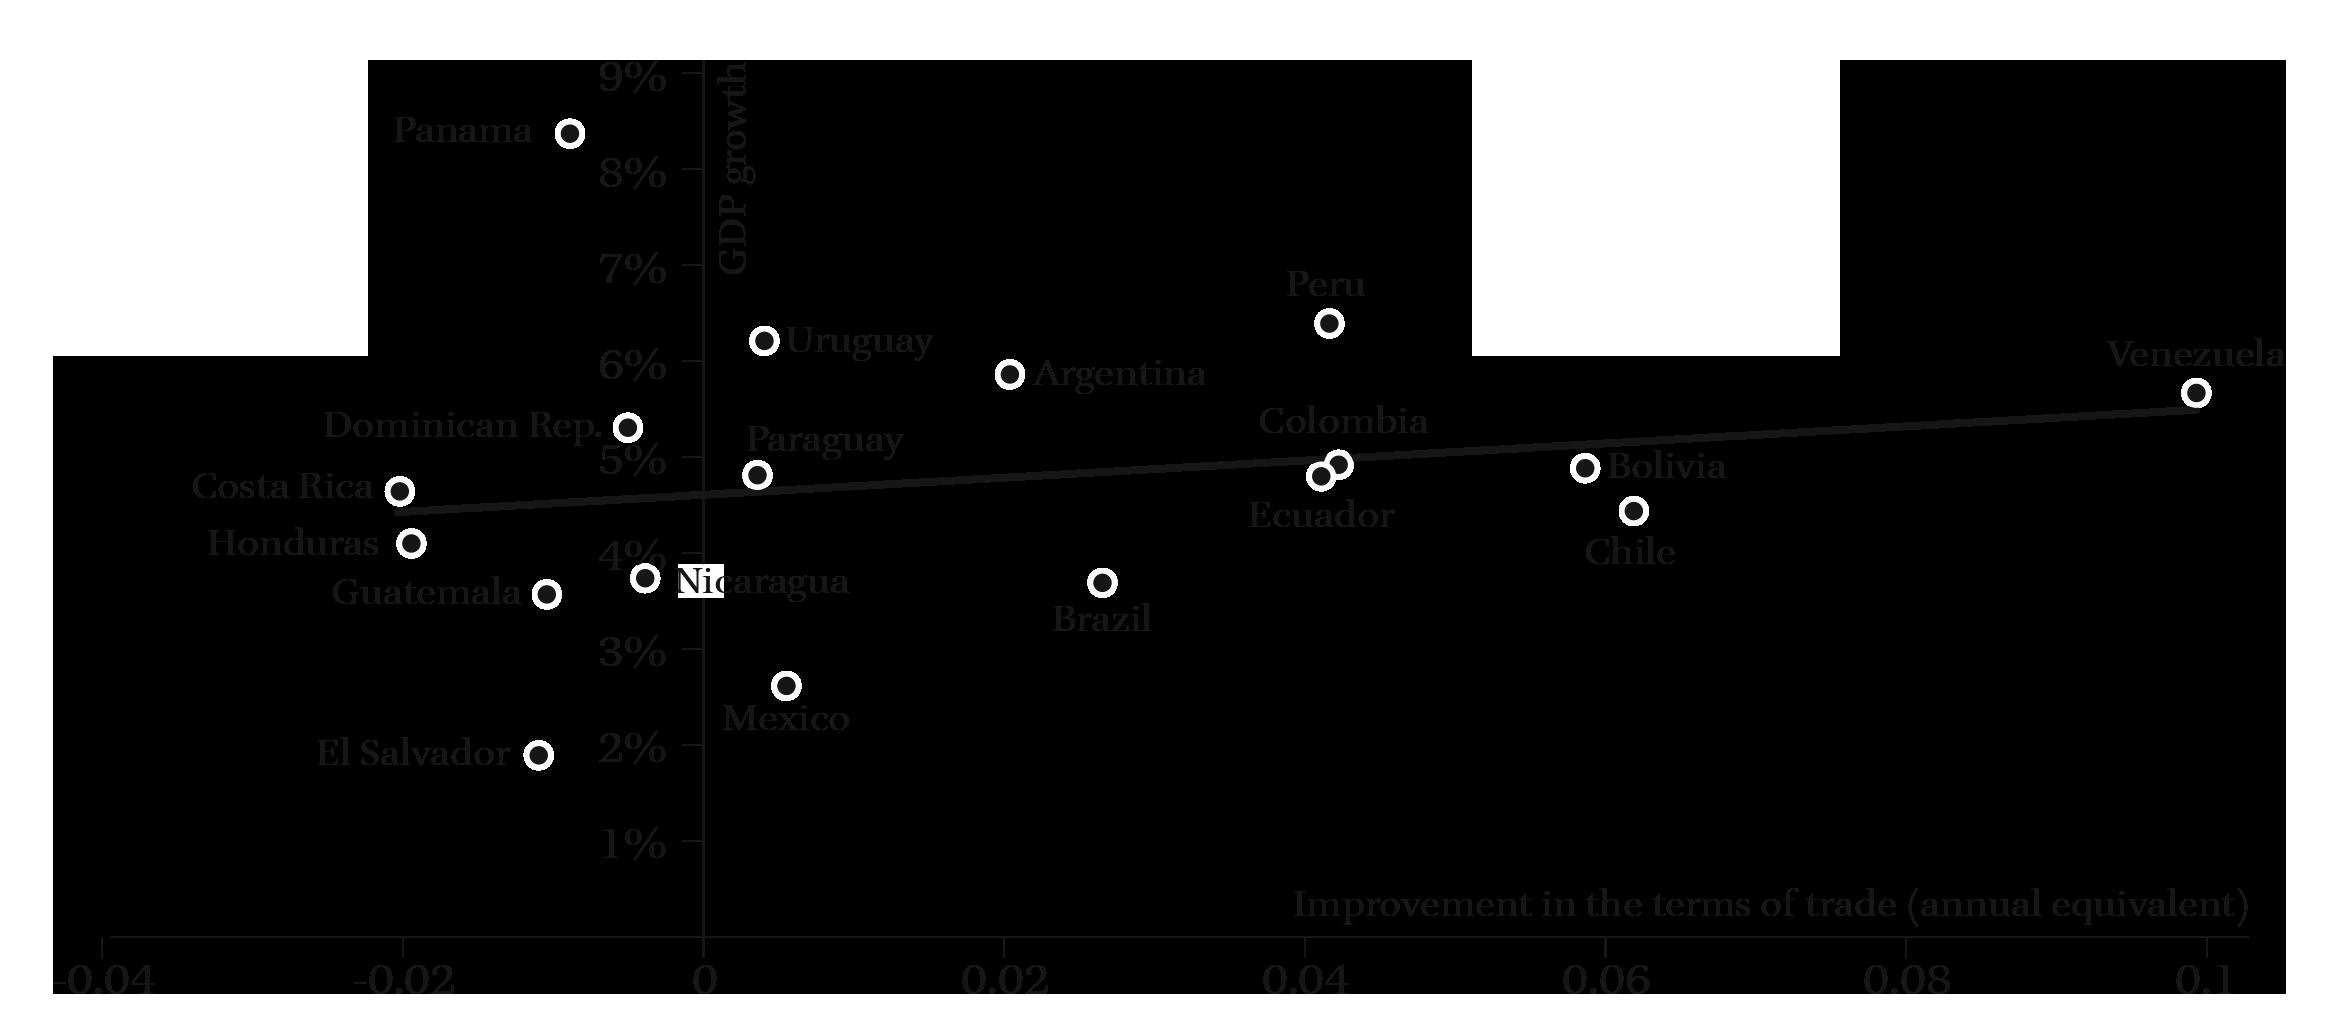 Commodity-Led Development in Latin America